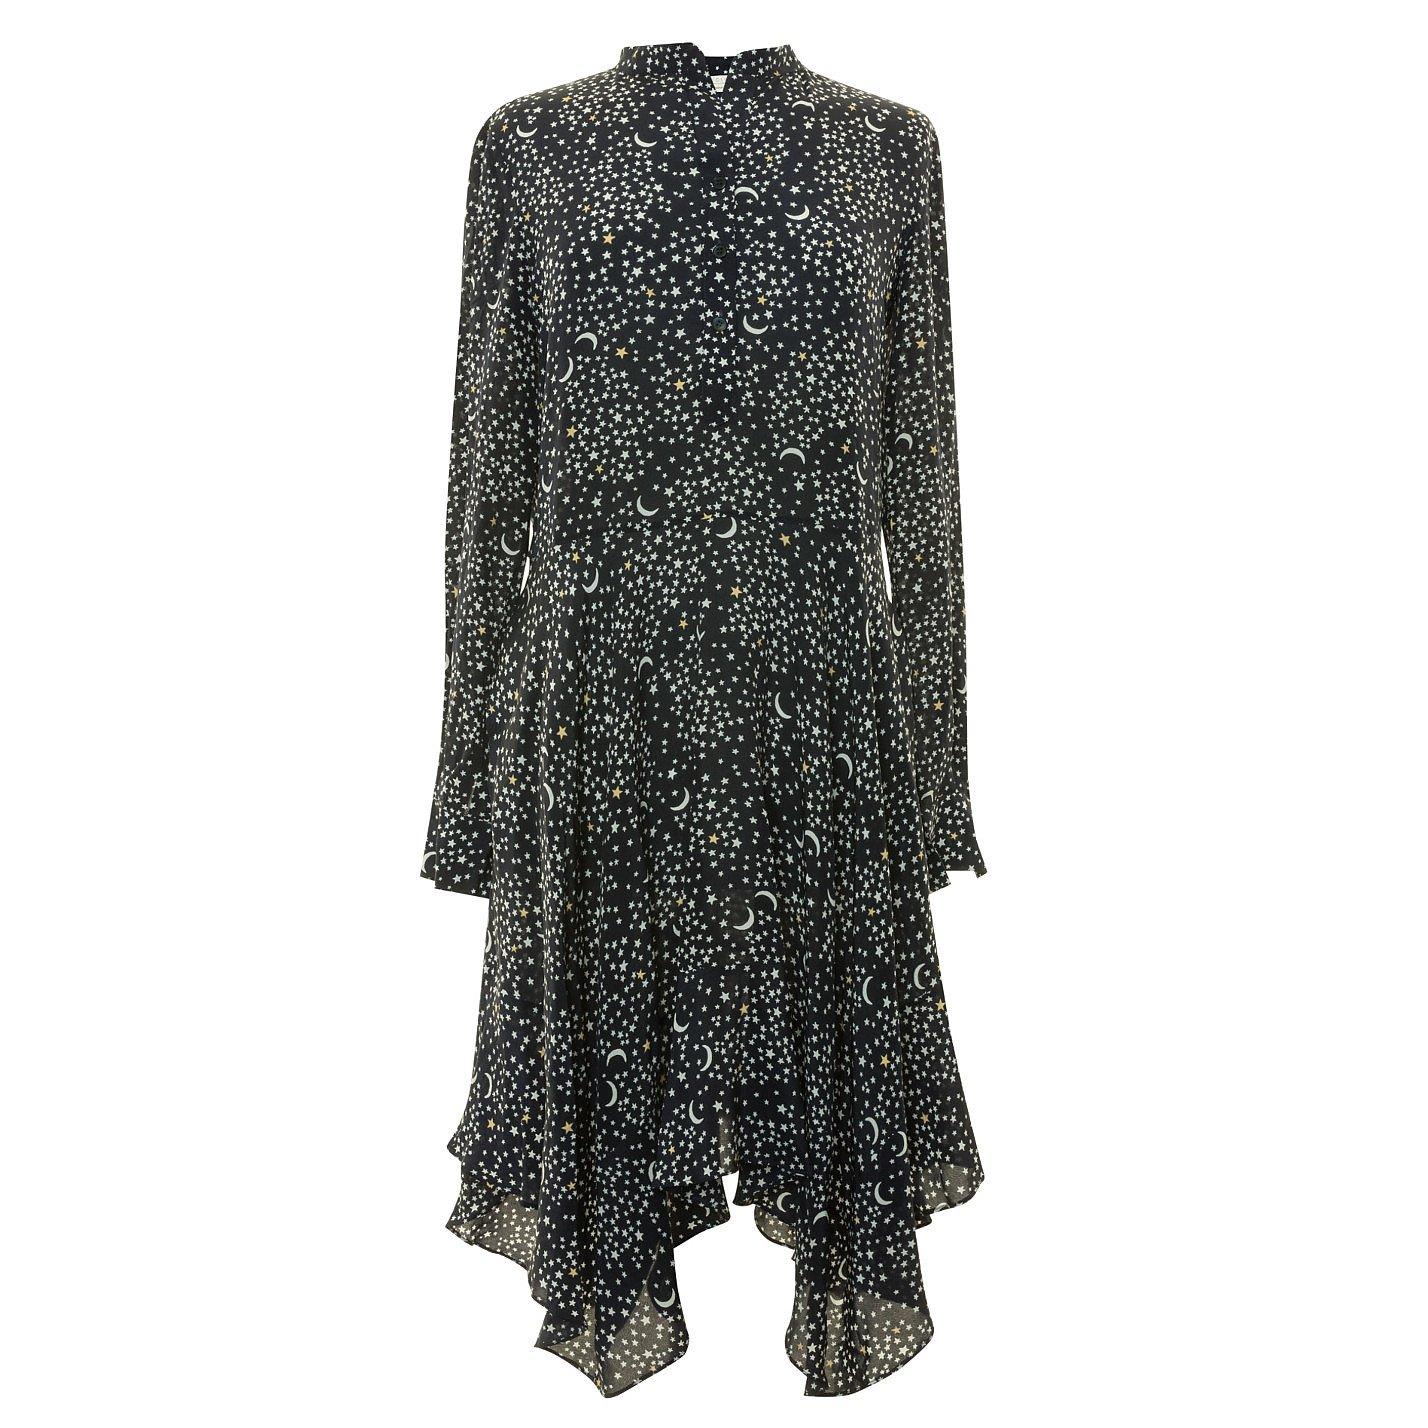 Stella McCartney Moon Print Dress